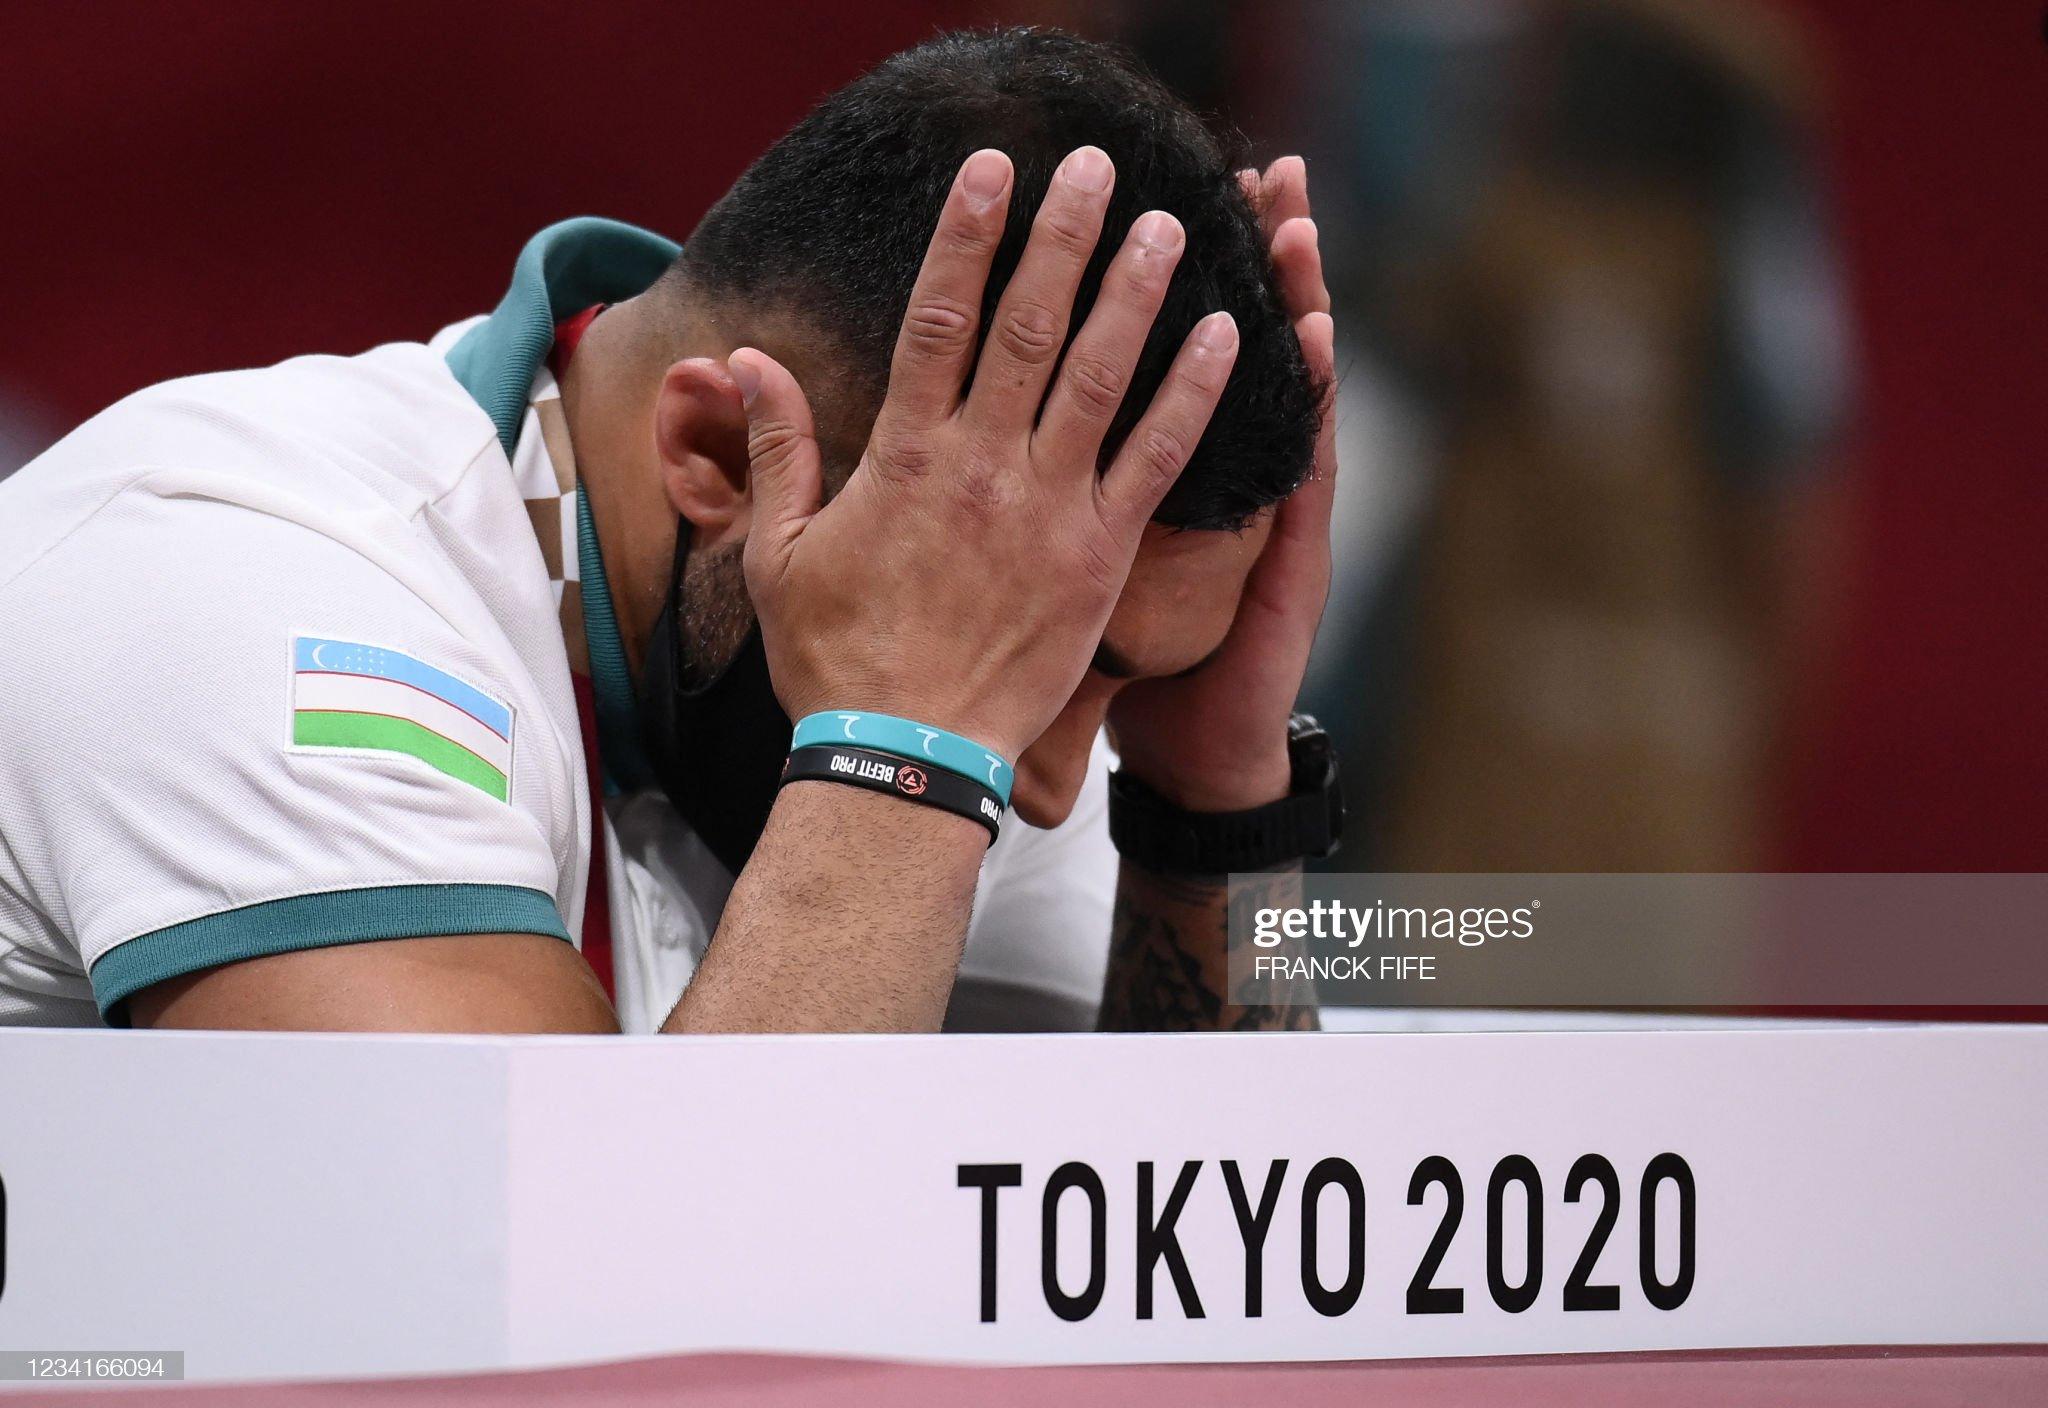 JUDO-OLY-2020-2021-TOKYO : News Photo